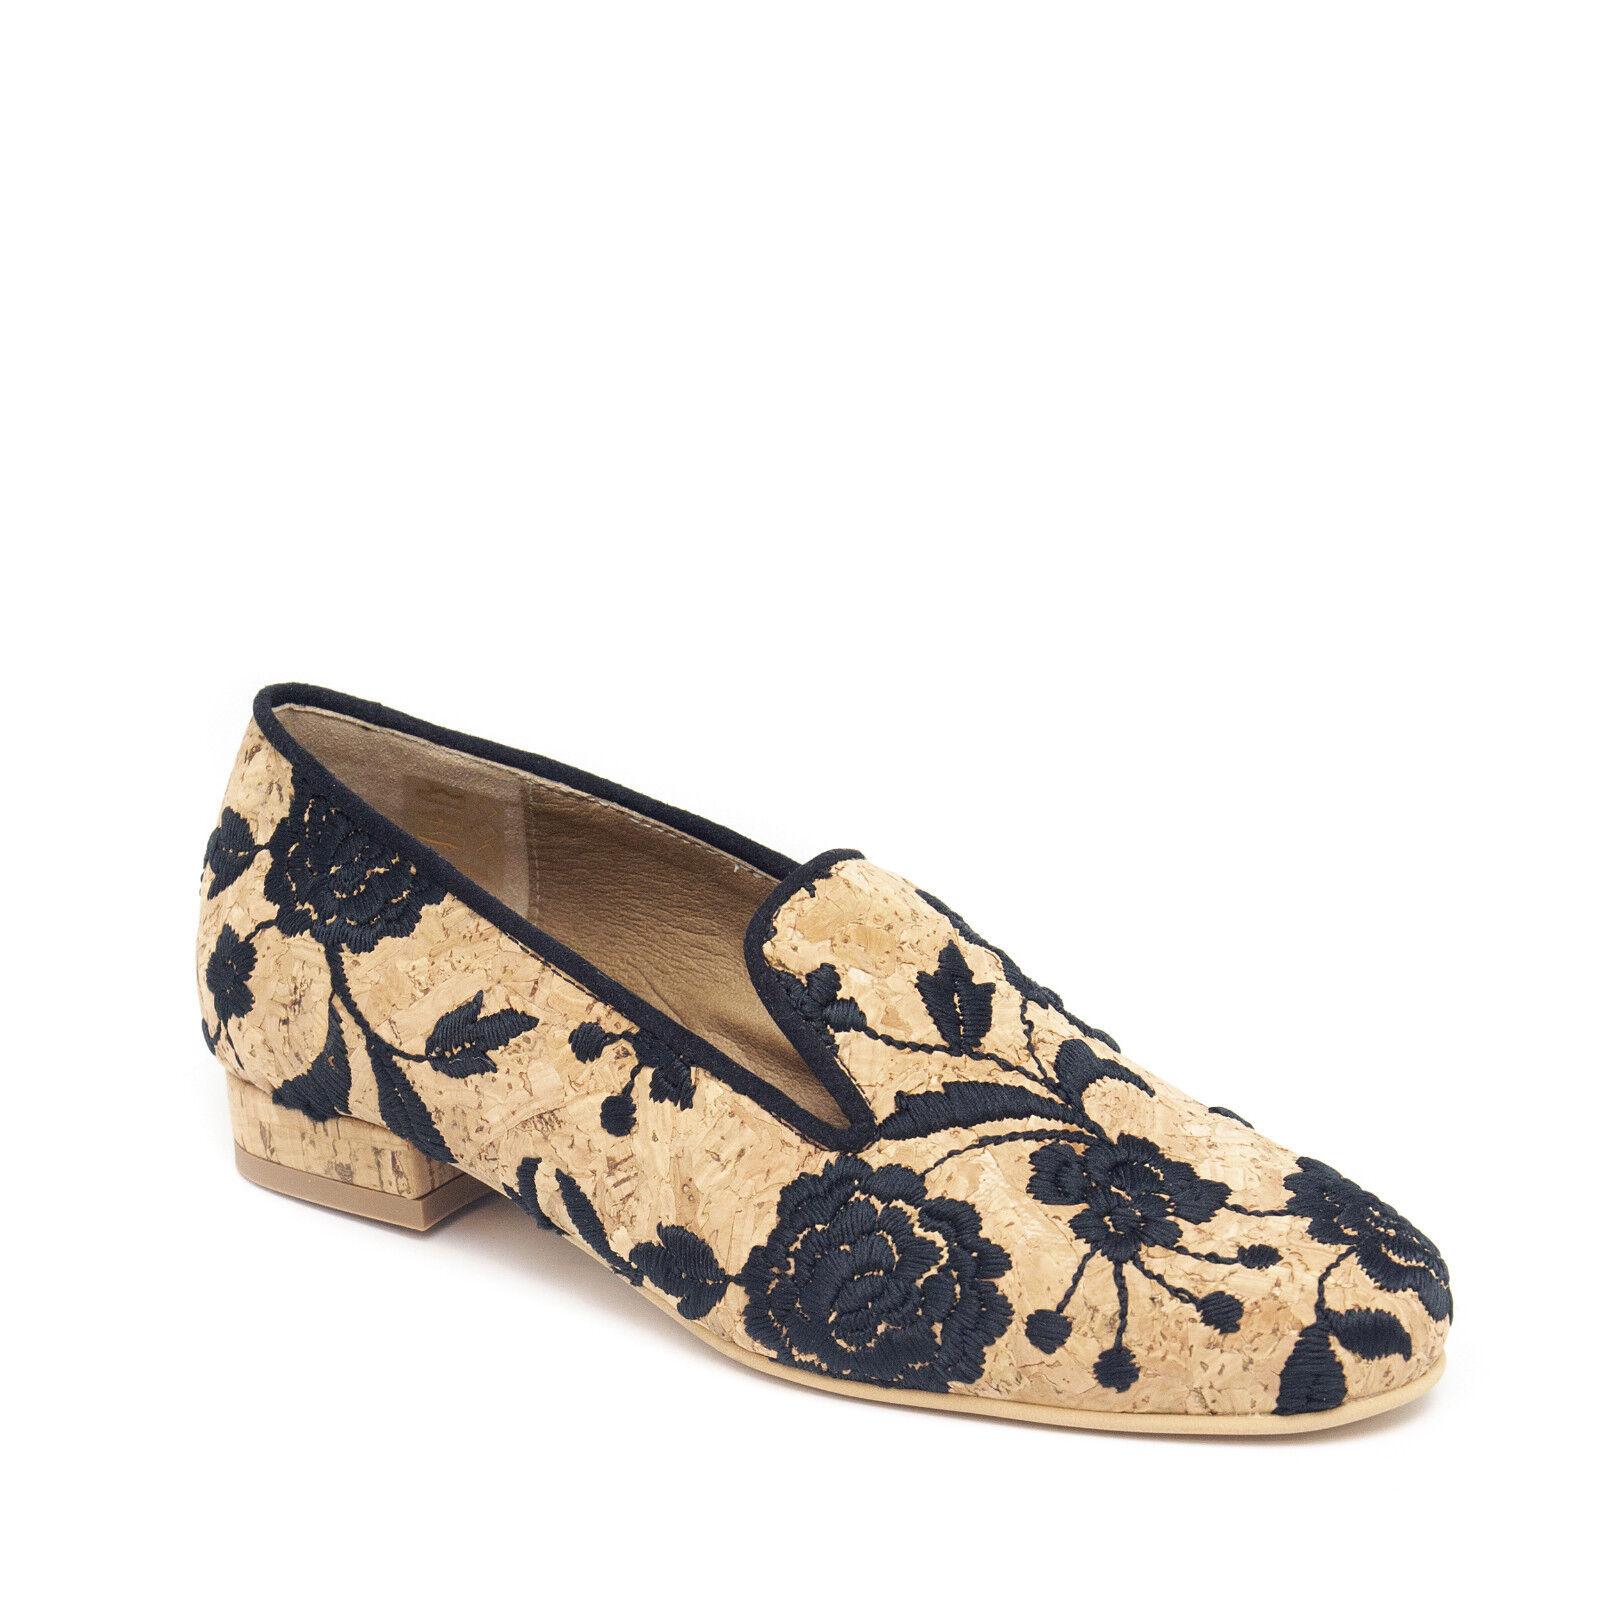 Mujer Mocasín Zapatos Planos Vegano hecha hecha hecha de corcho orgánica Bordado en patrón de flor  directo de fábrica